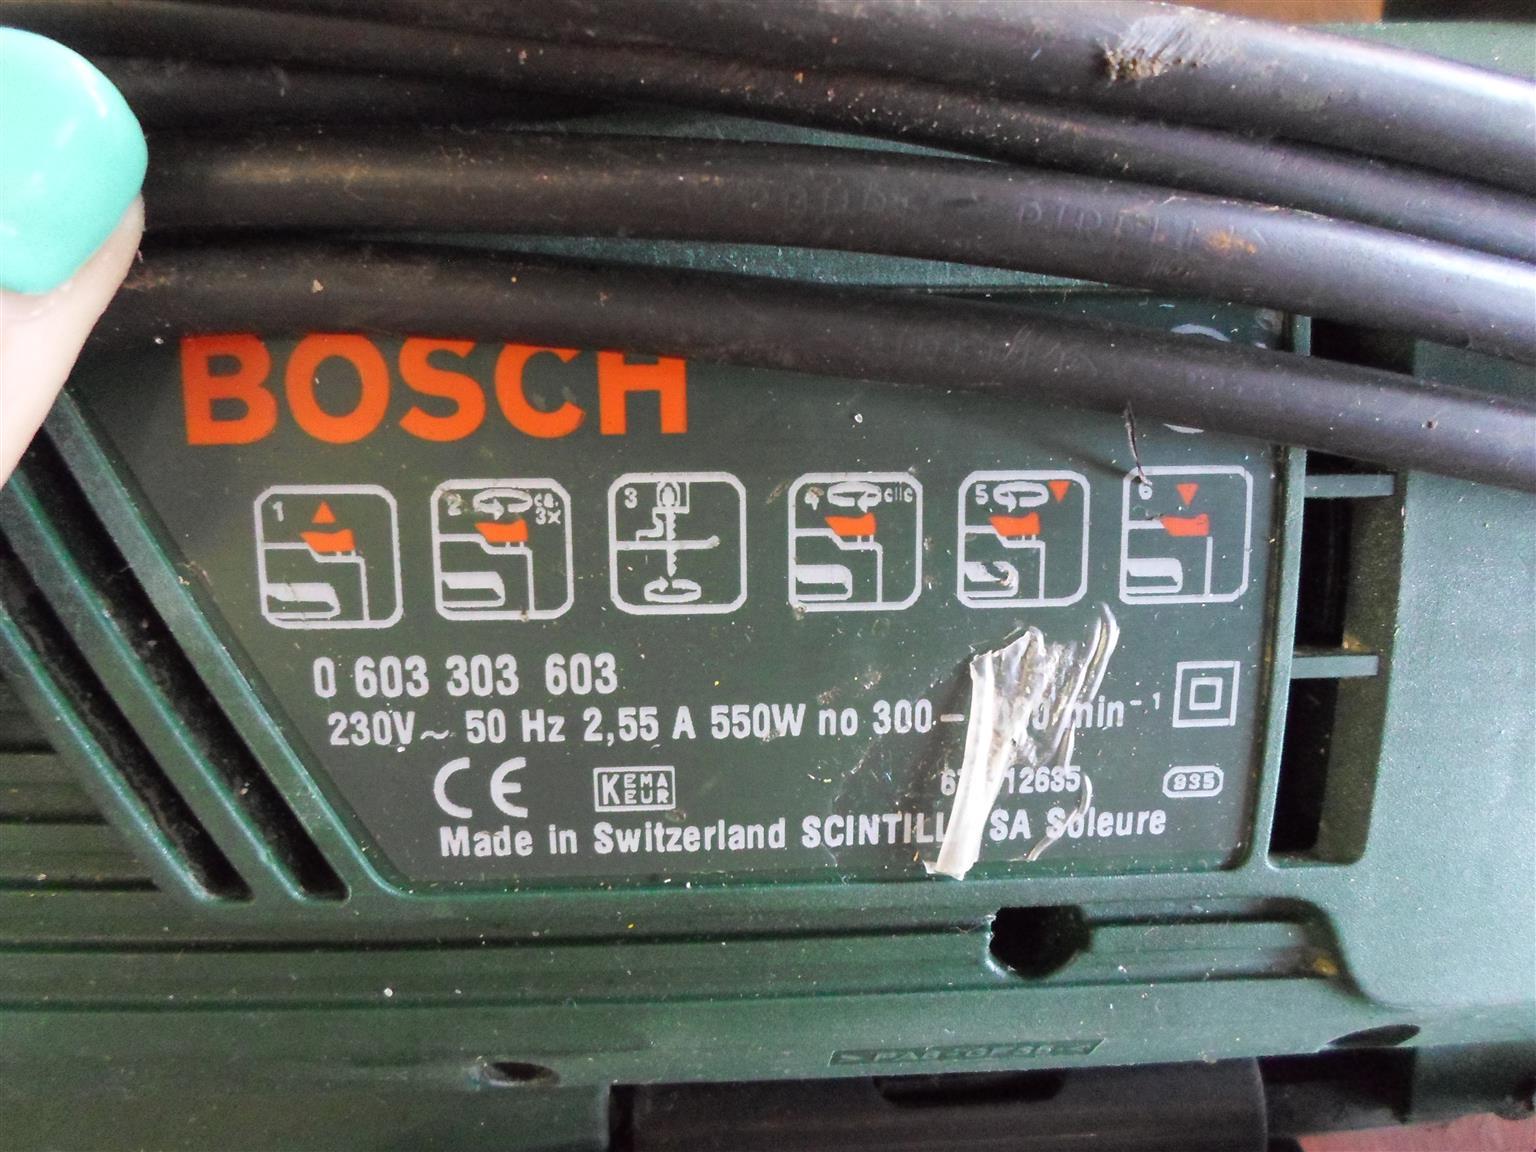 550W Bosch PST 700 PAE Jig Saw